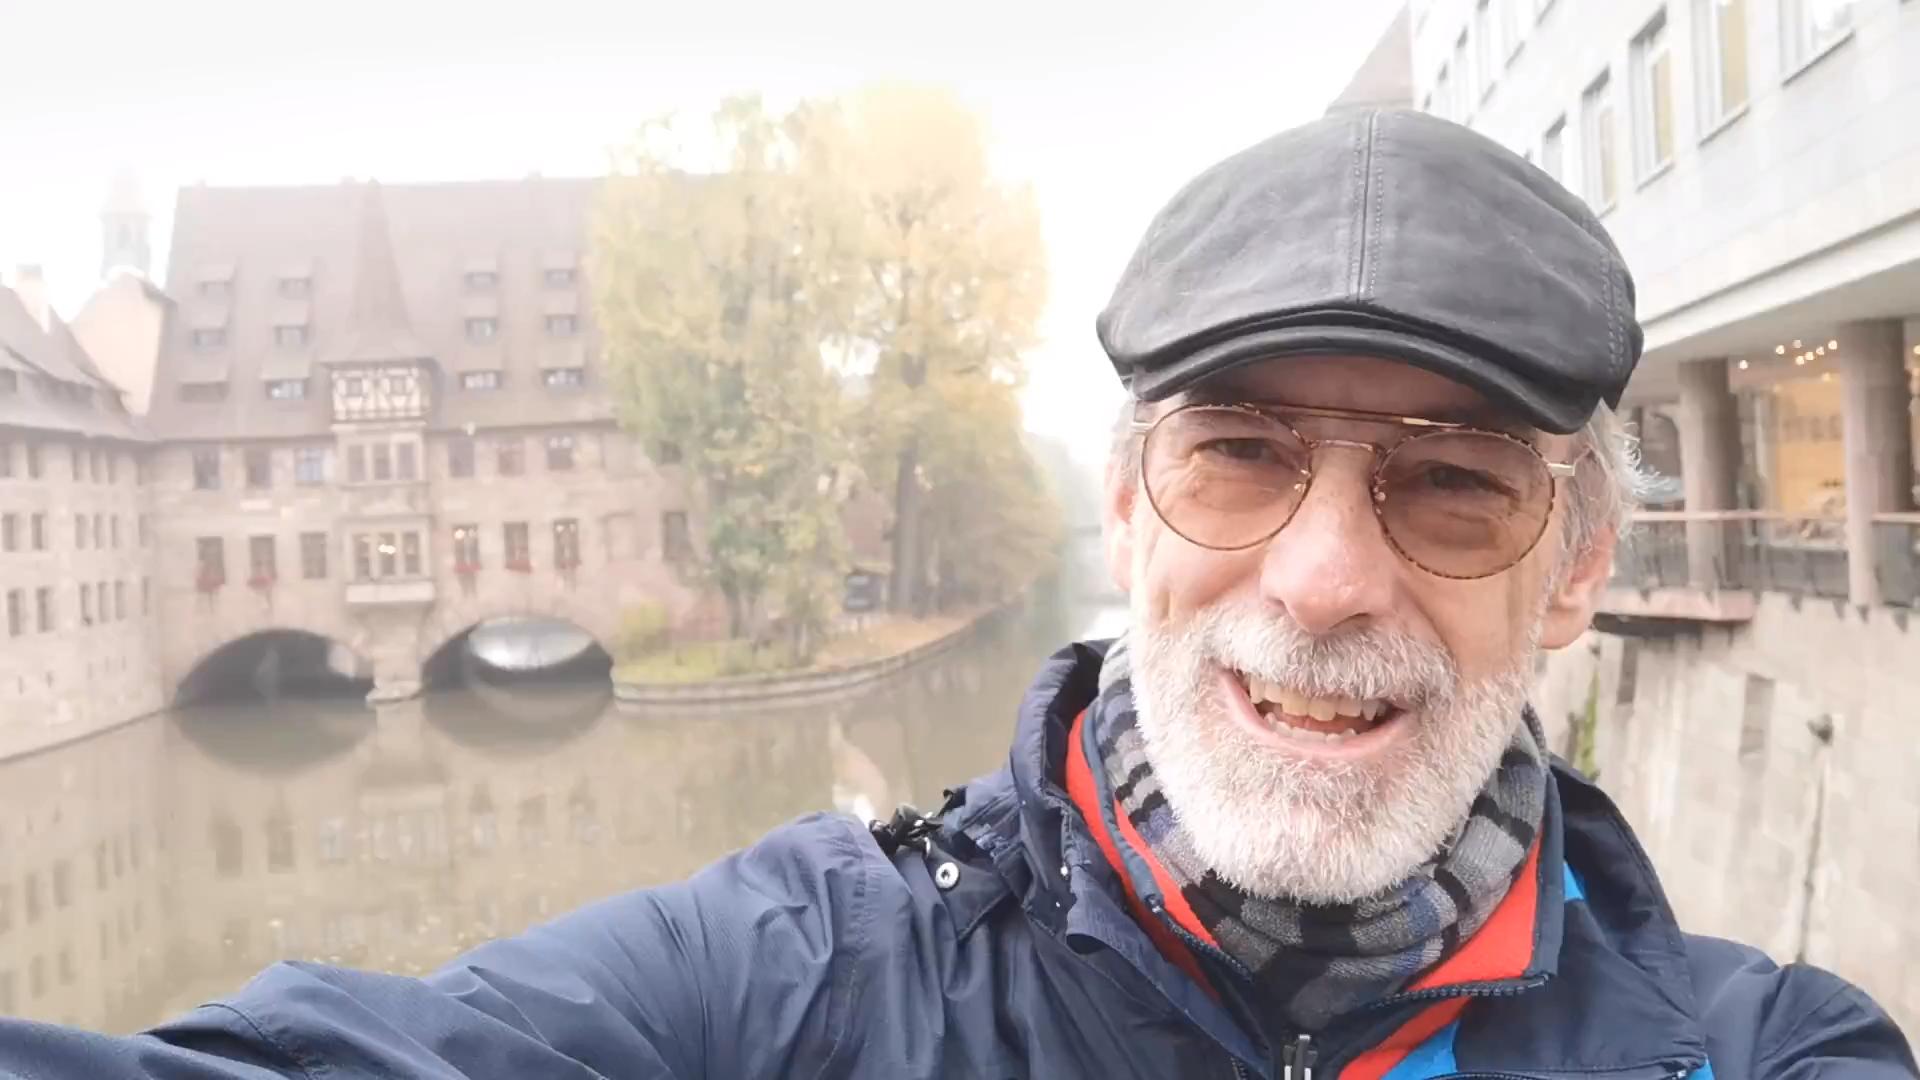 #Nuremberg Tours in English with #HappyTourCustomers having fun during my Nuremberg Old Town Walking Tour